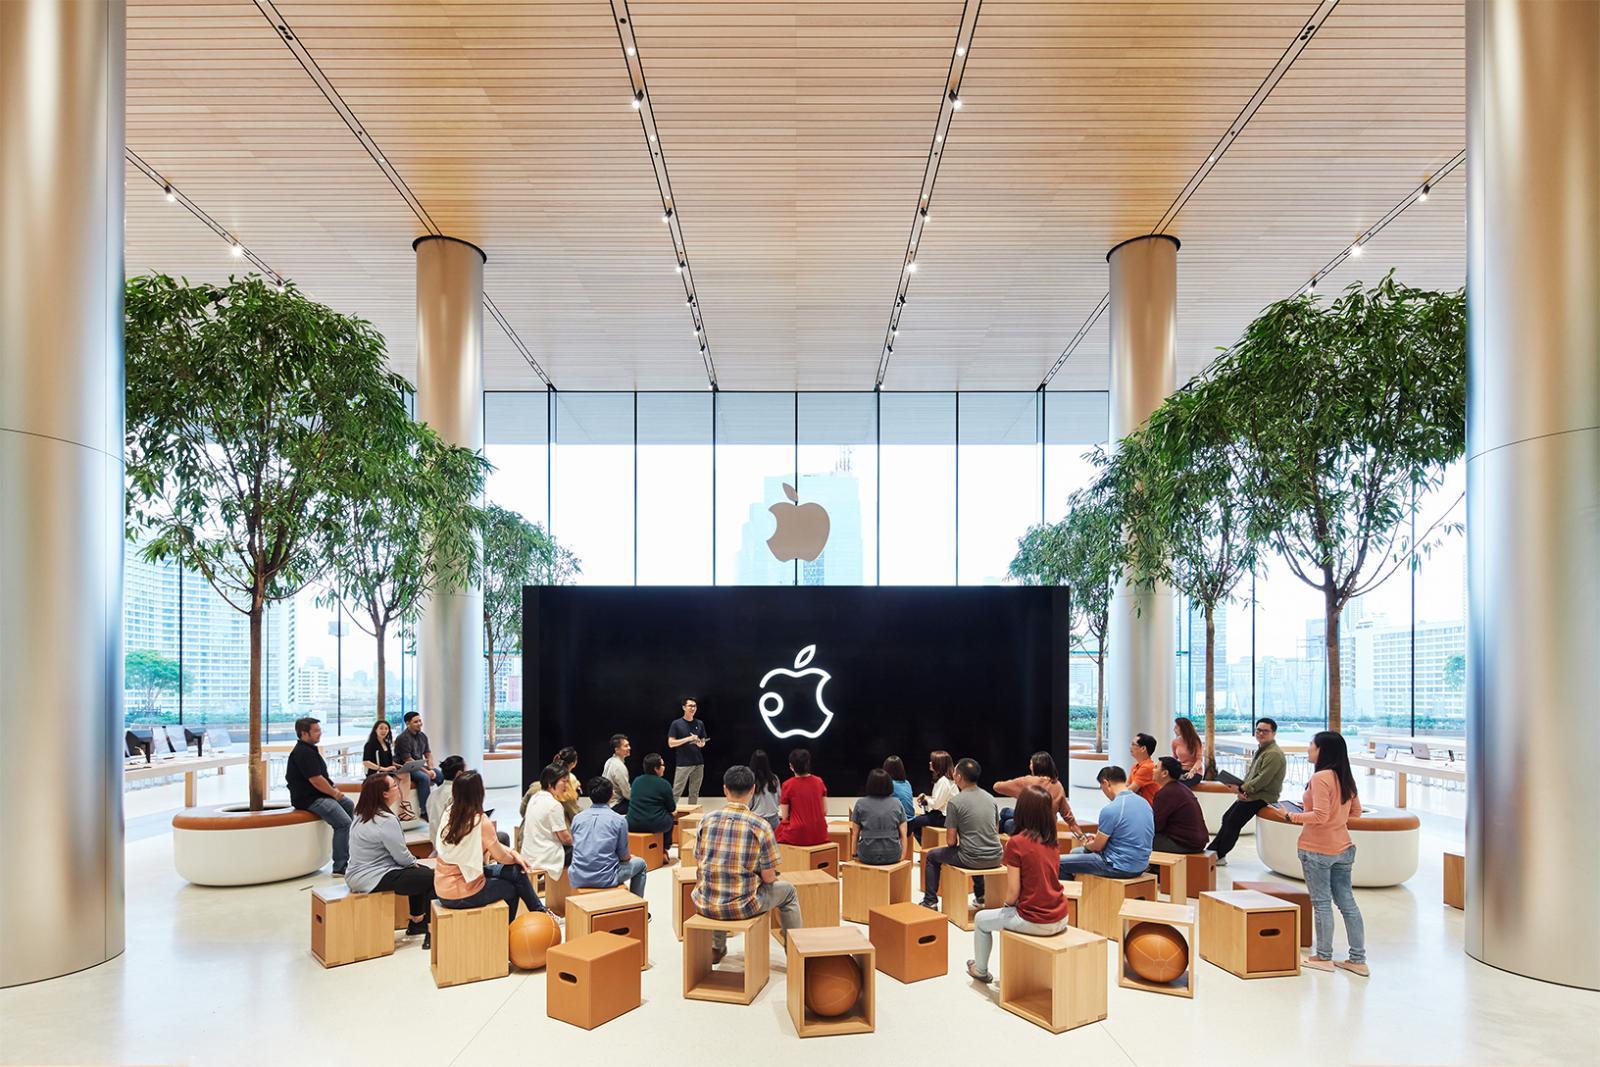 """Apple Iconsiam"" ริมแม่น้ำเจ้าพระยากับยอดขายทั่วโลก 46.9 ล้านเครื่อง"